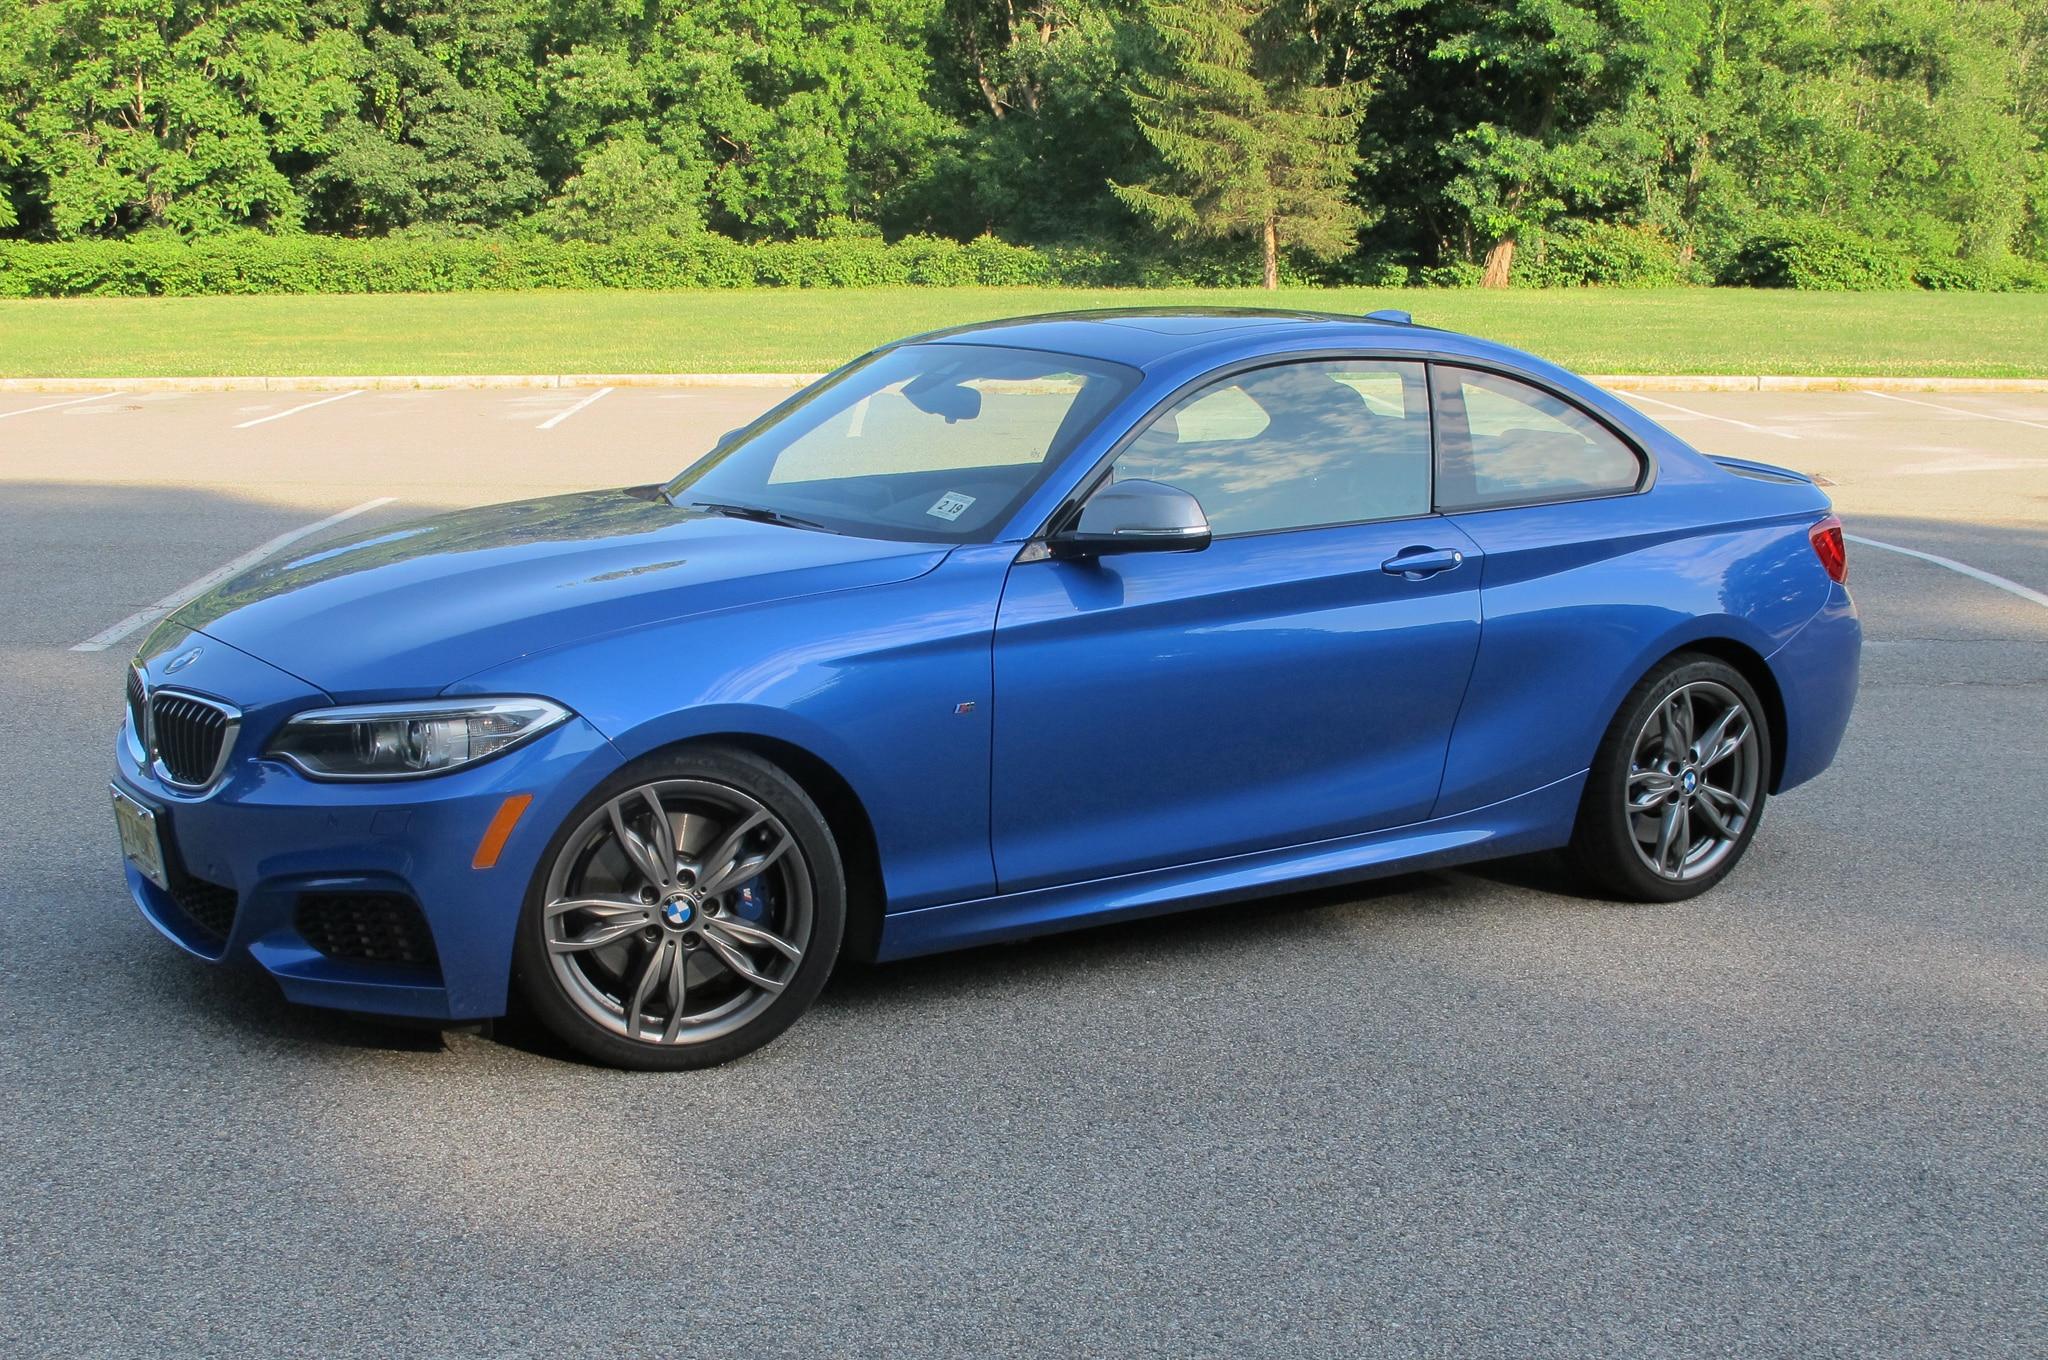 2014 BMW M235i Front Three Quarter 05